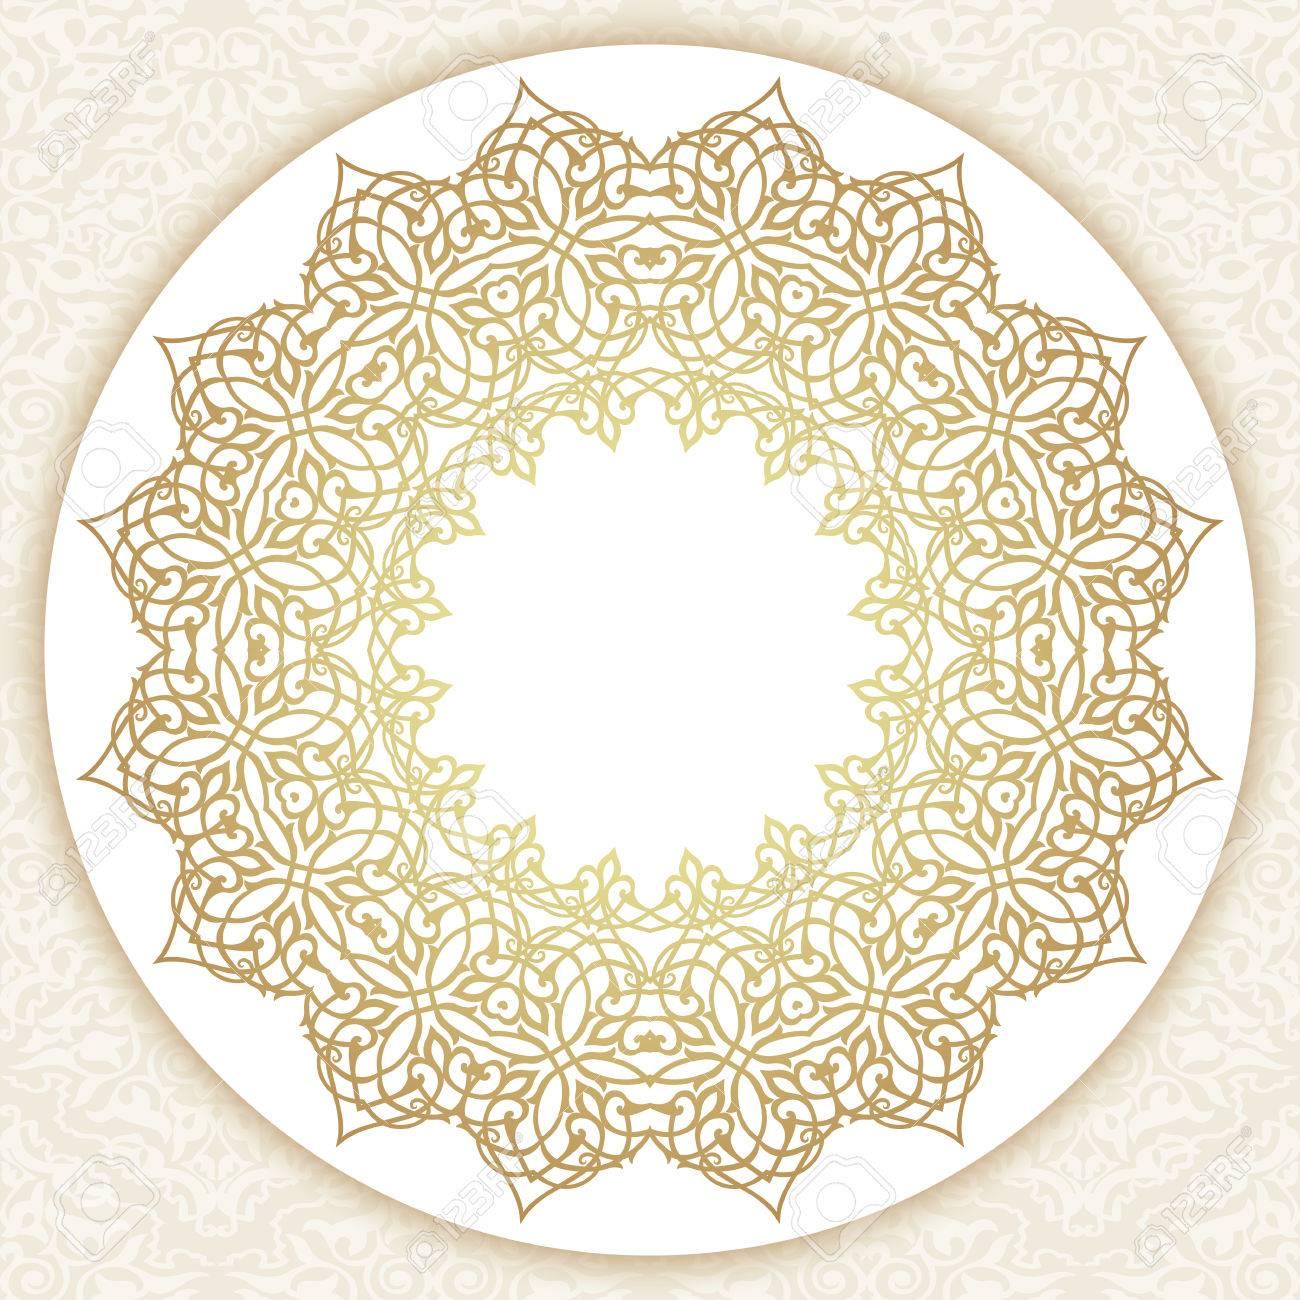 decorative ornate round frame in victorian style ornamental